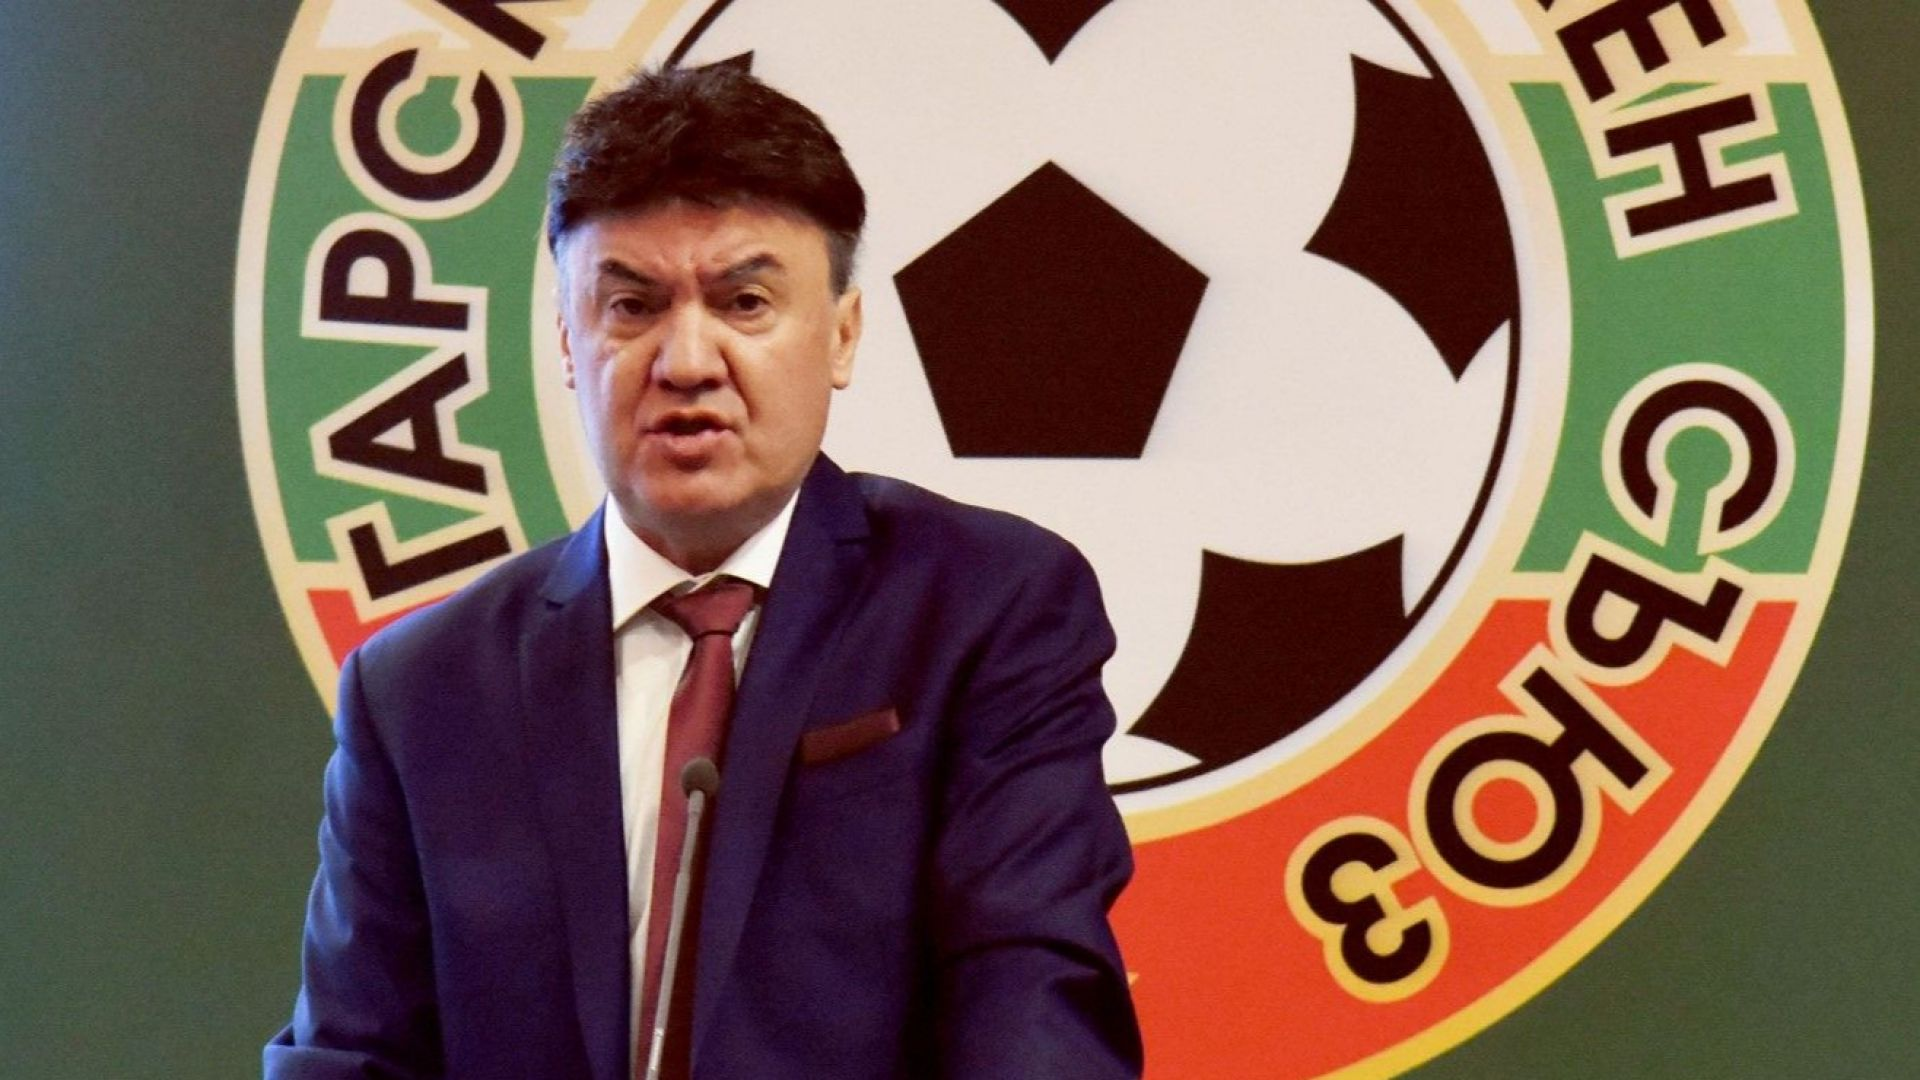 Борислав Михайлов: Турция има 100 милиона бюджет и пак не играе на Мондиал